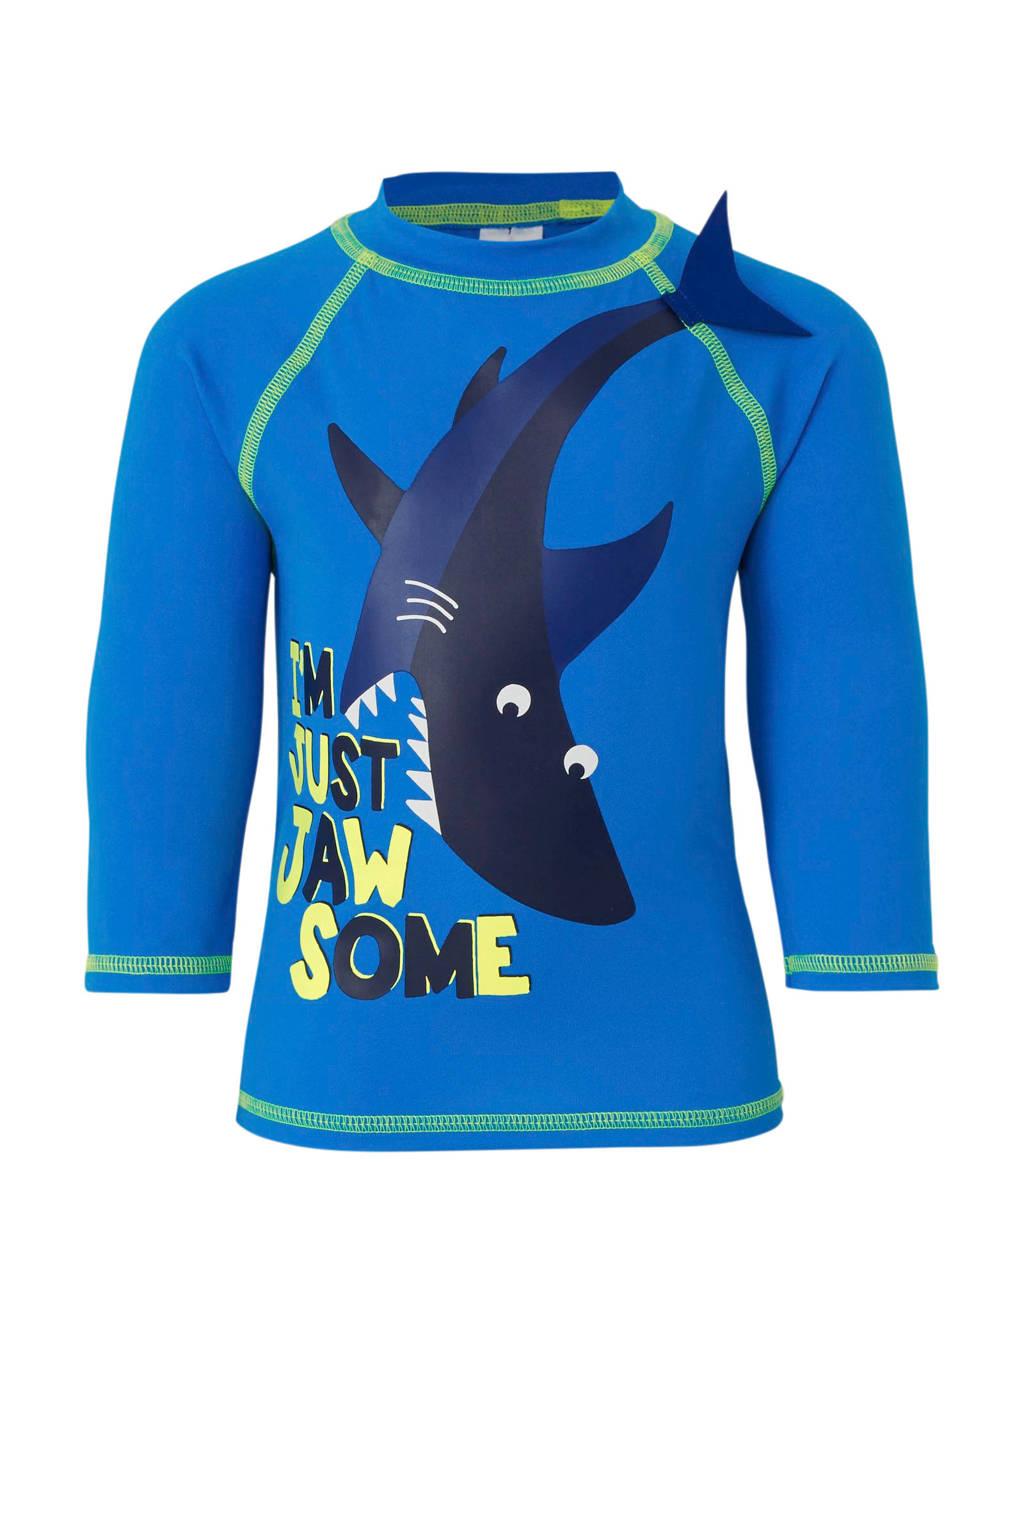 C&A Rodeo UV T-shirt met printopdruk blauw, Blauw